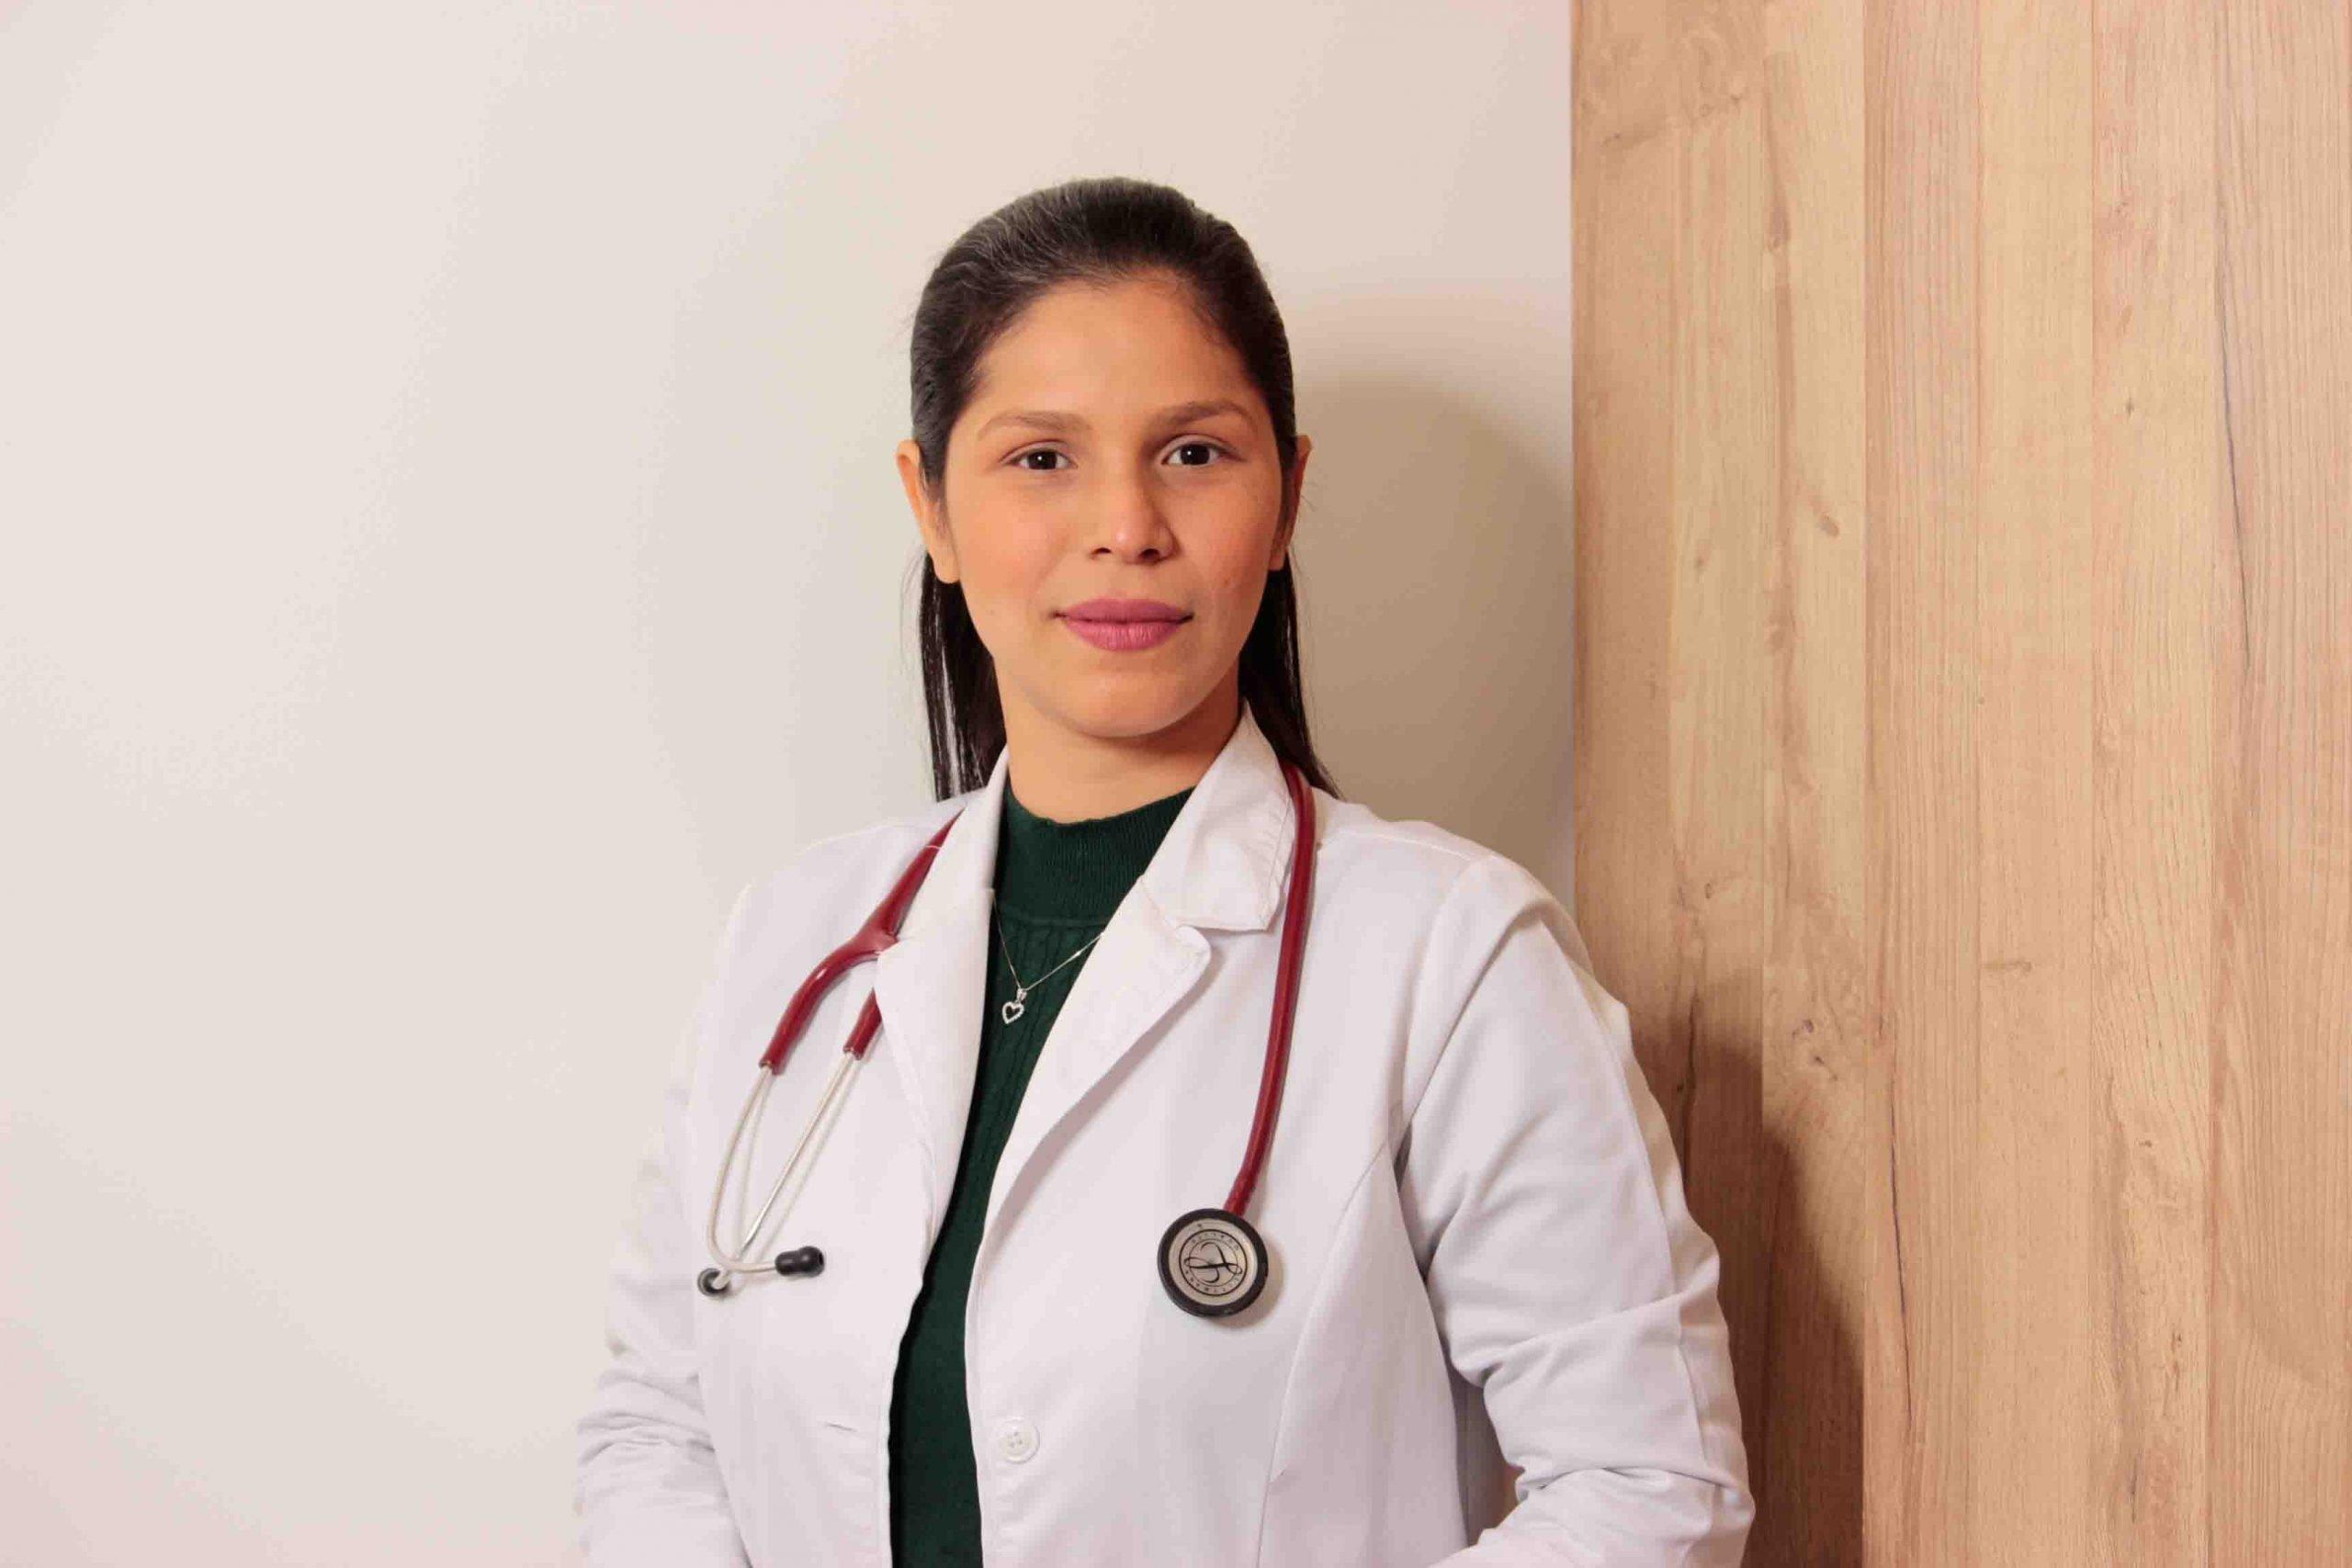 Dra. Karen Patricia Luna Orozco